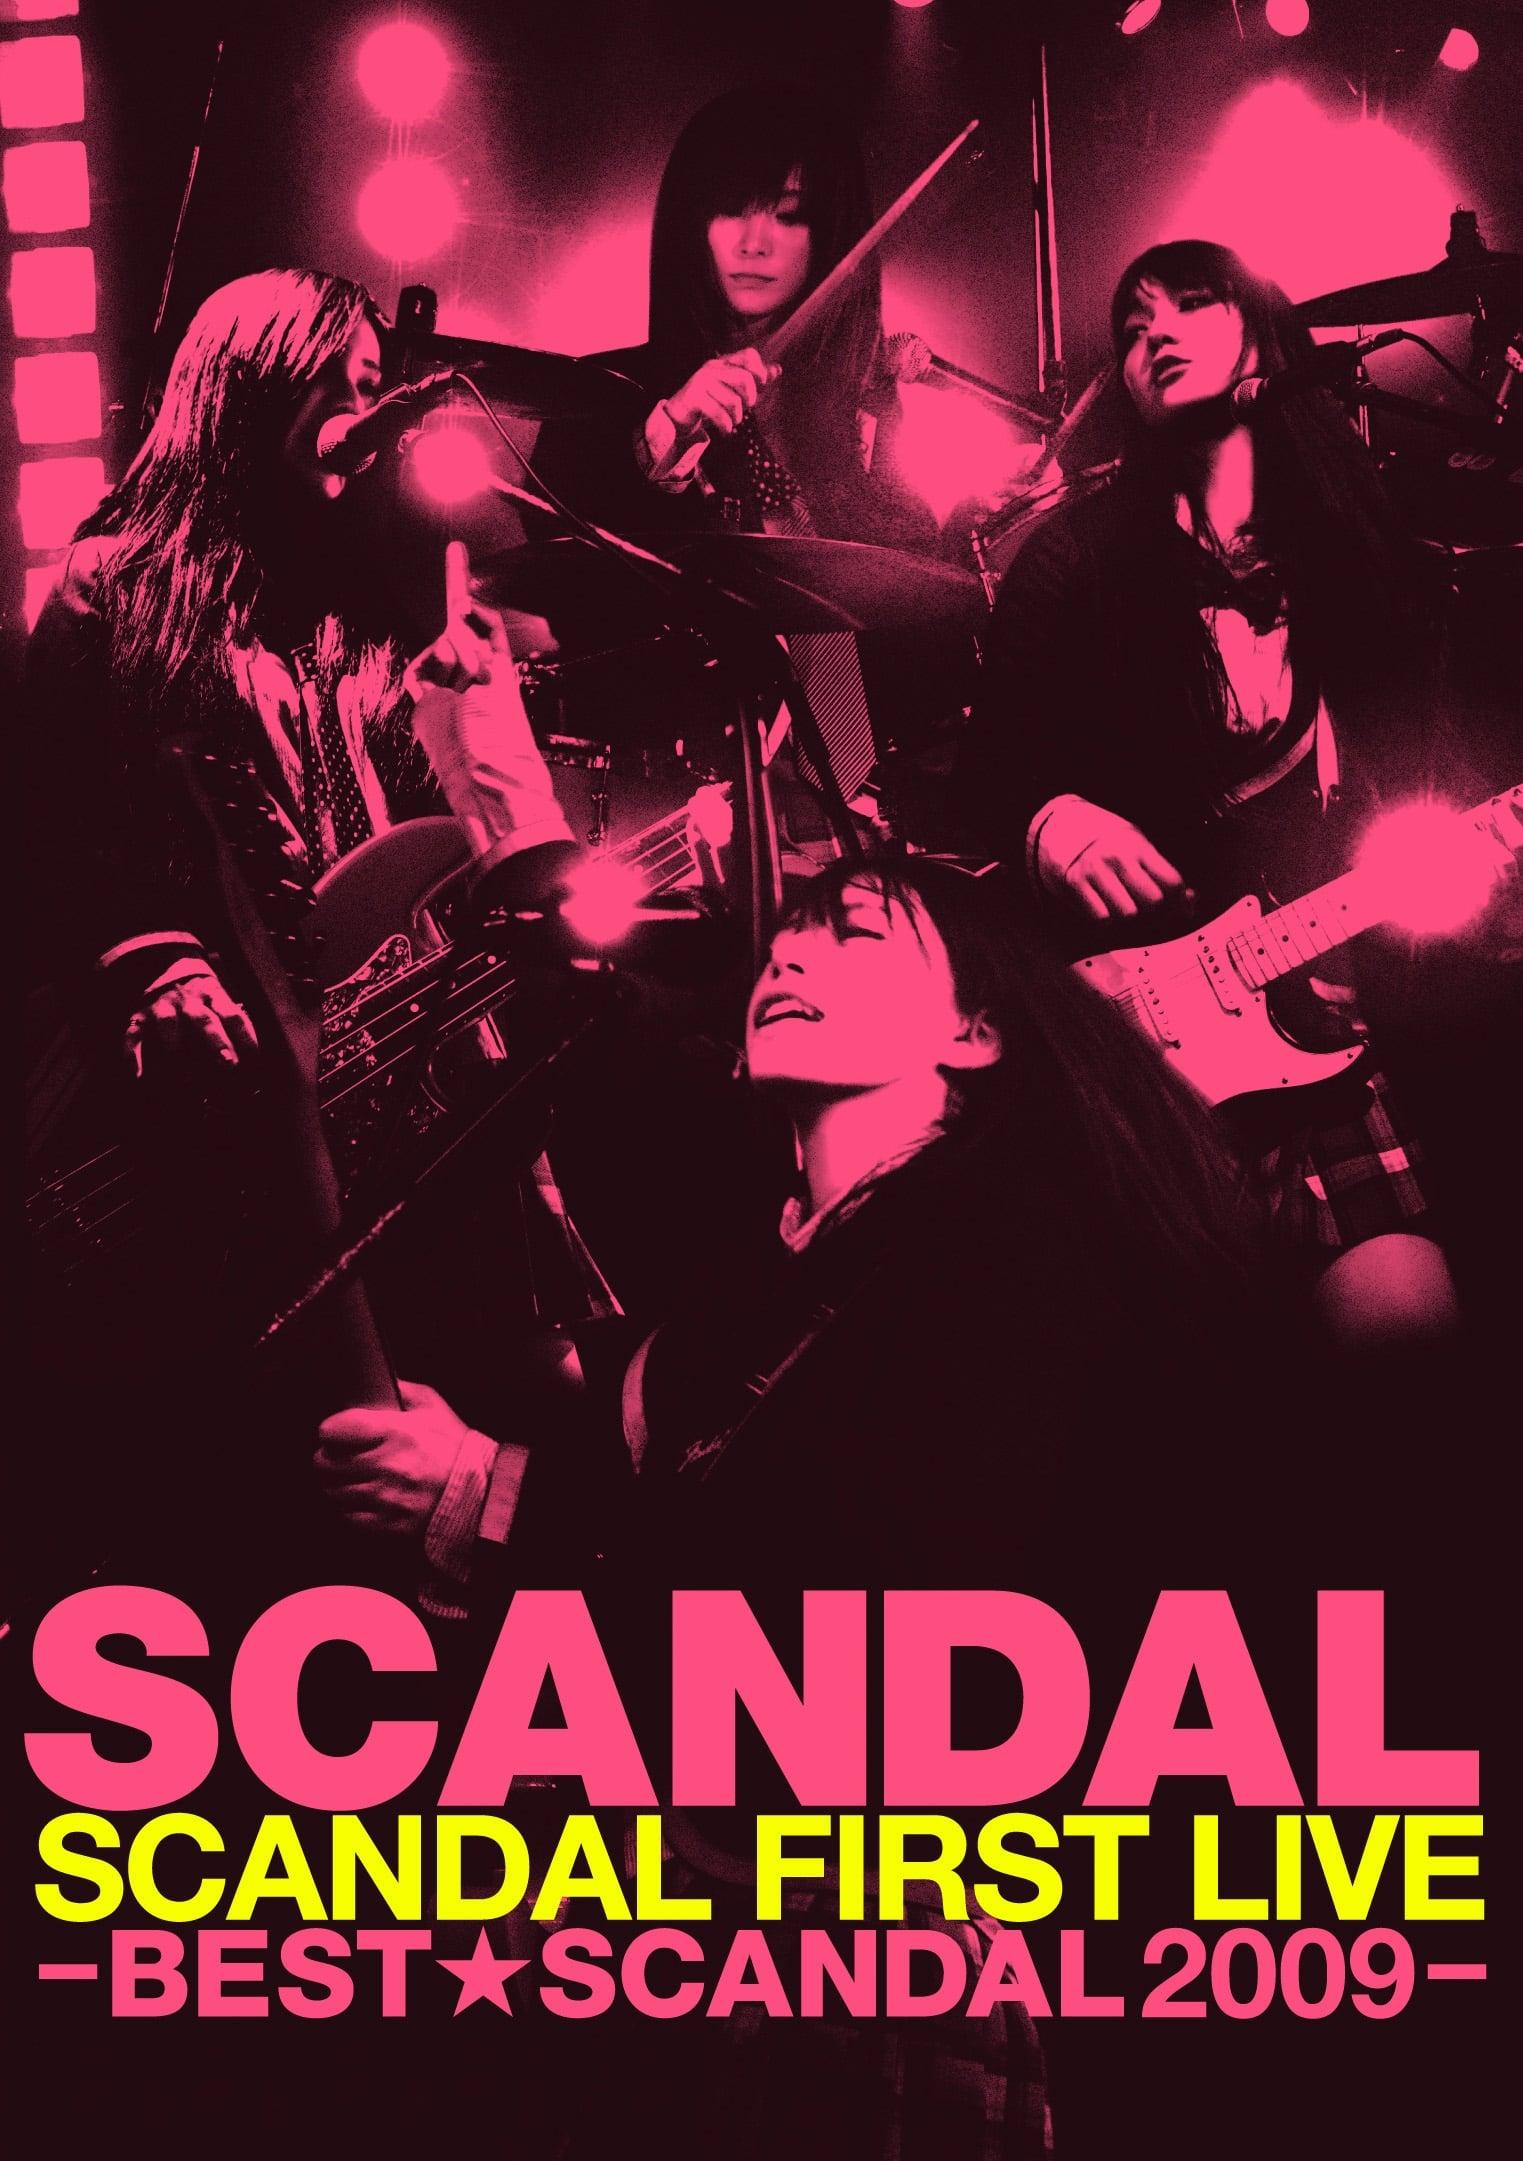 SCANDAL FIRST LIVE -BEST★SCANDAL 2009- (2010)